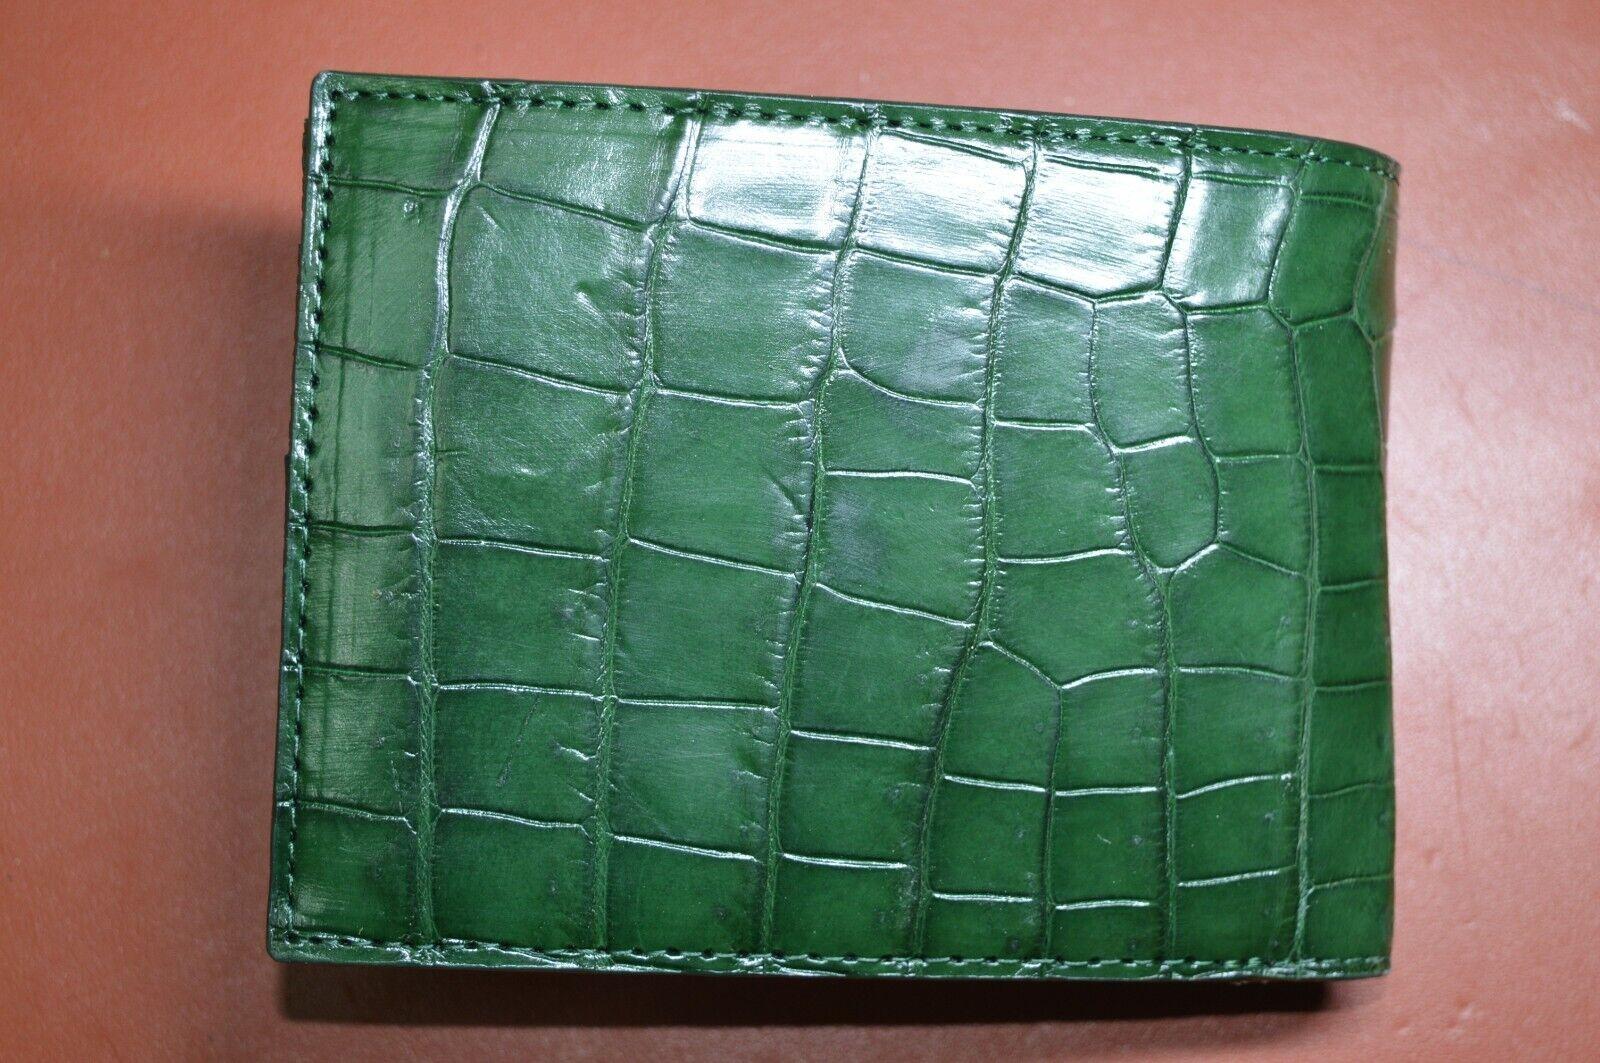 GENUINE Alligator,CROCODILE s bally Leather Skin MEN'S BIFOLD WALLET